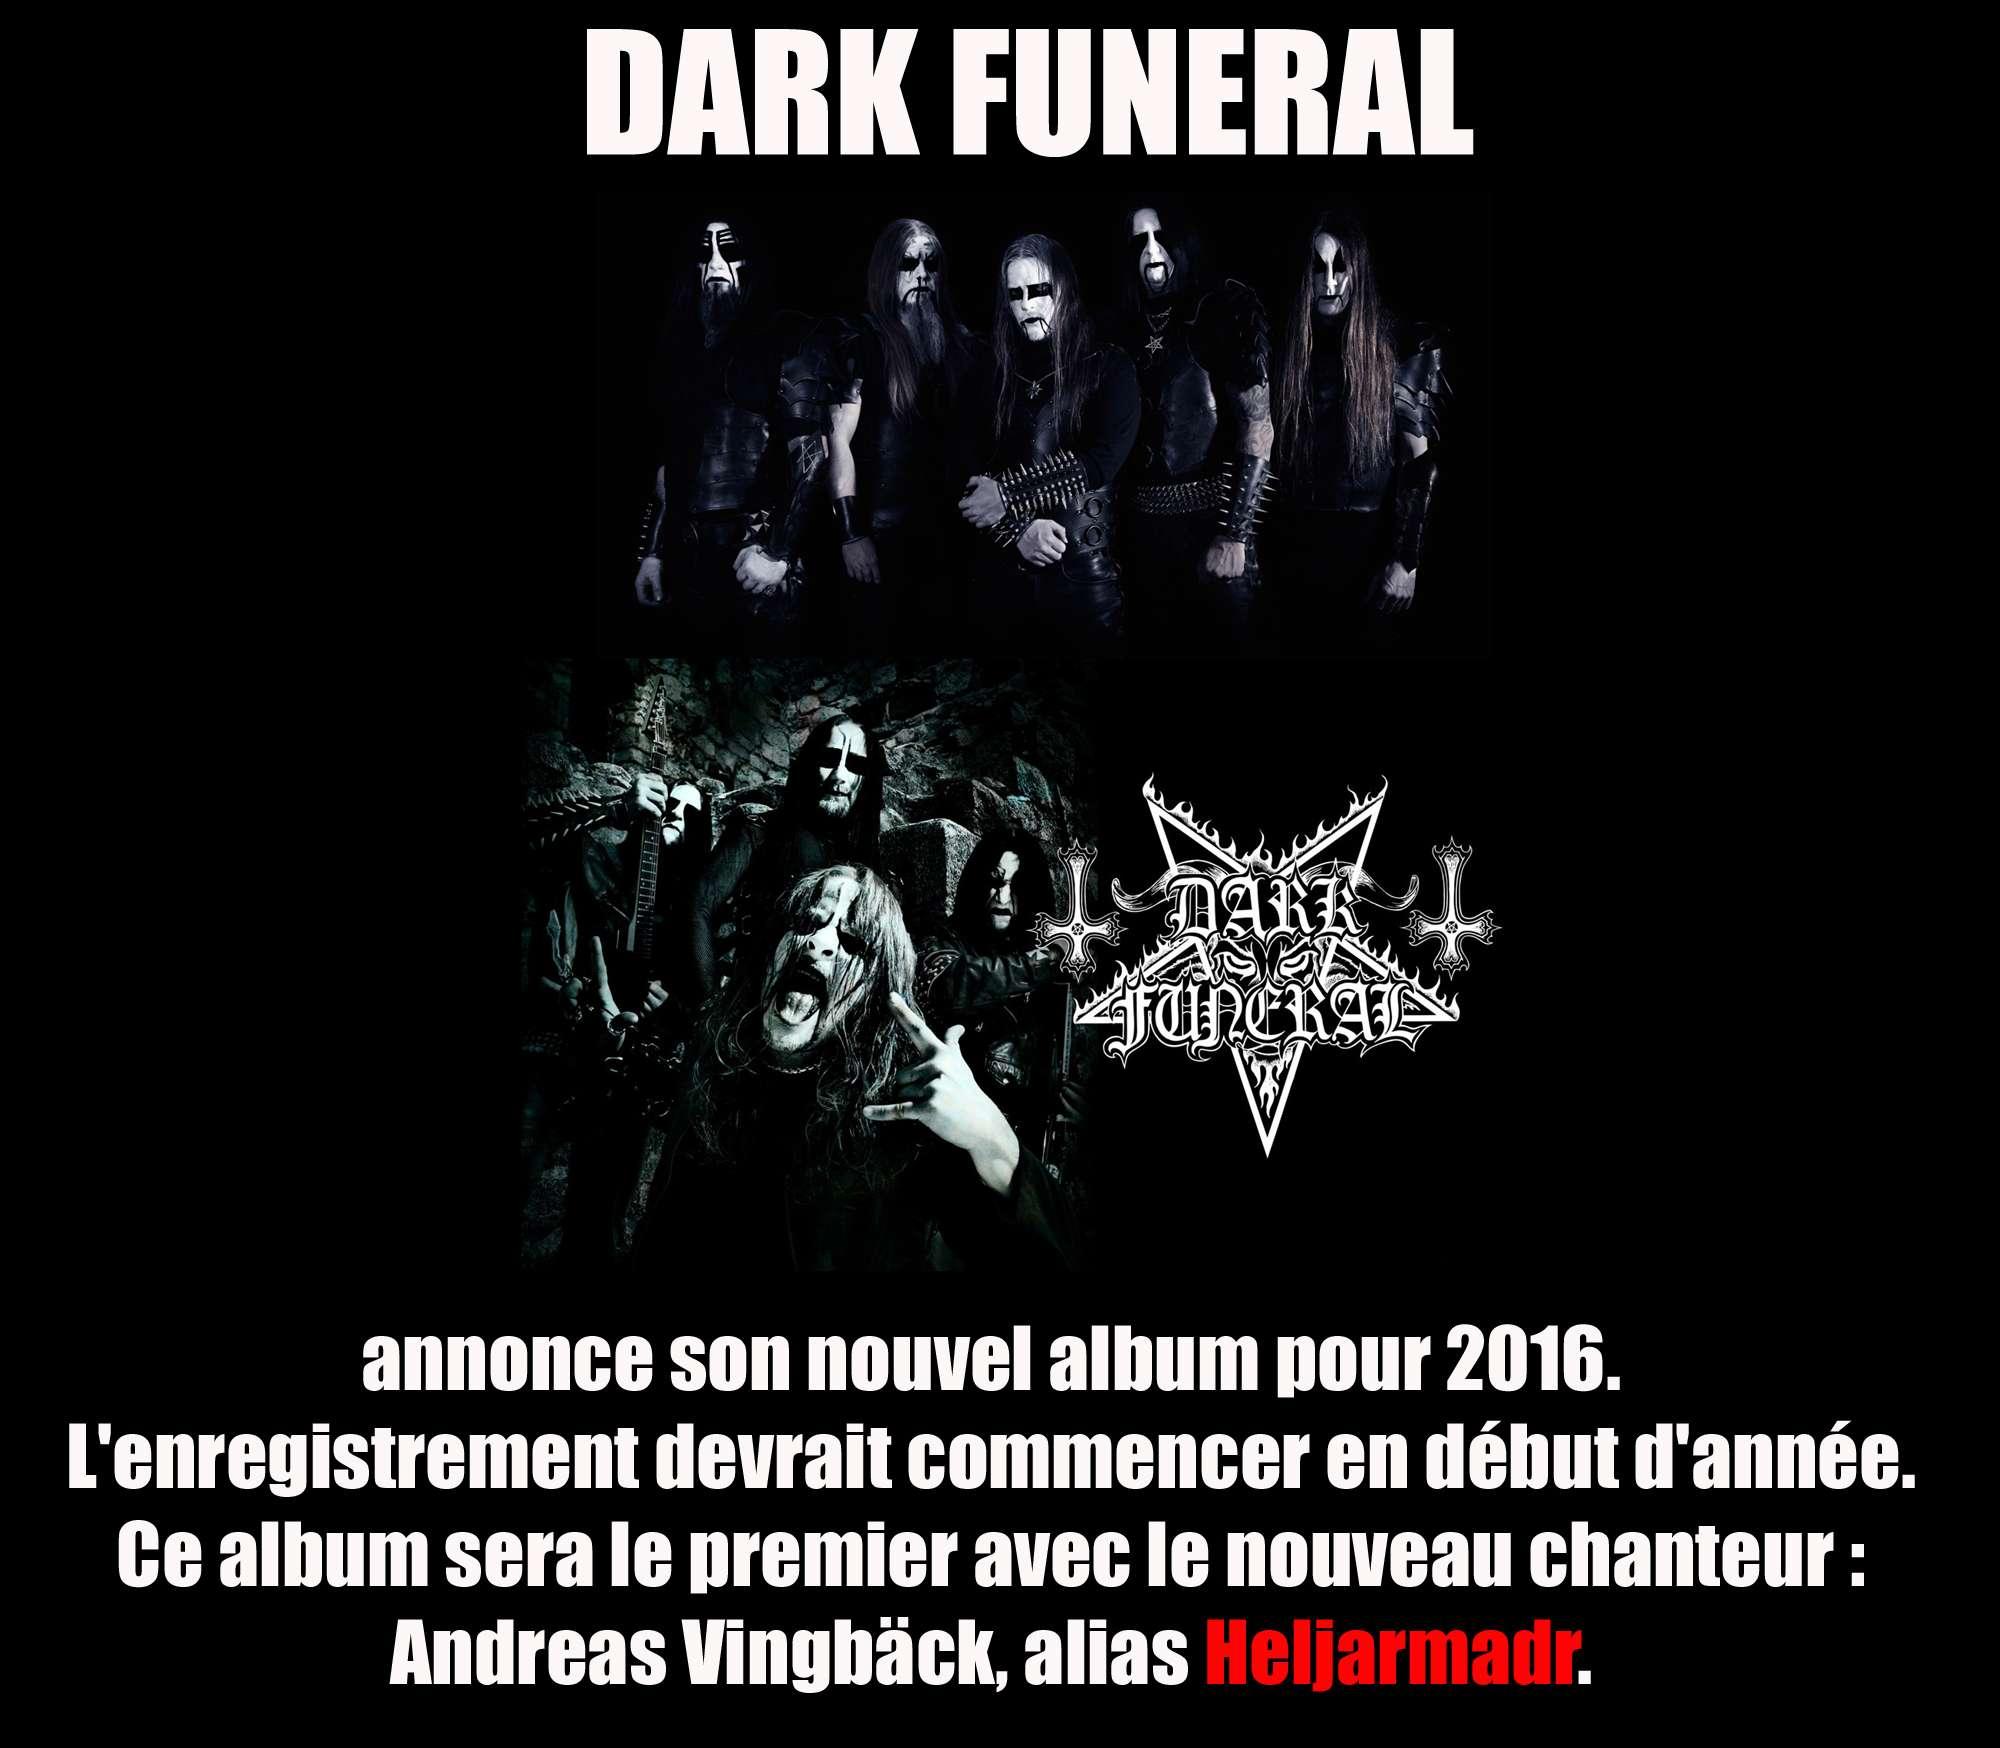 Les NEWS du METAL en VRAC ... - Page 18 Dark_f10